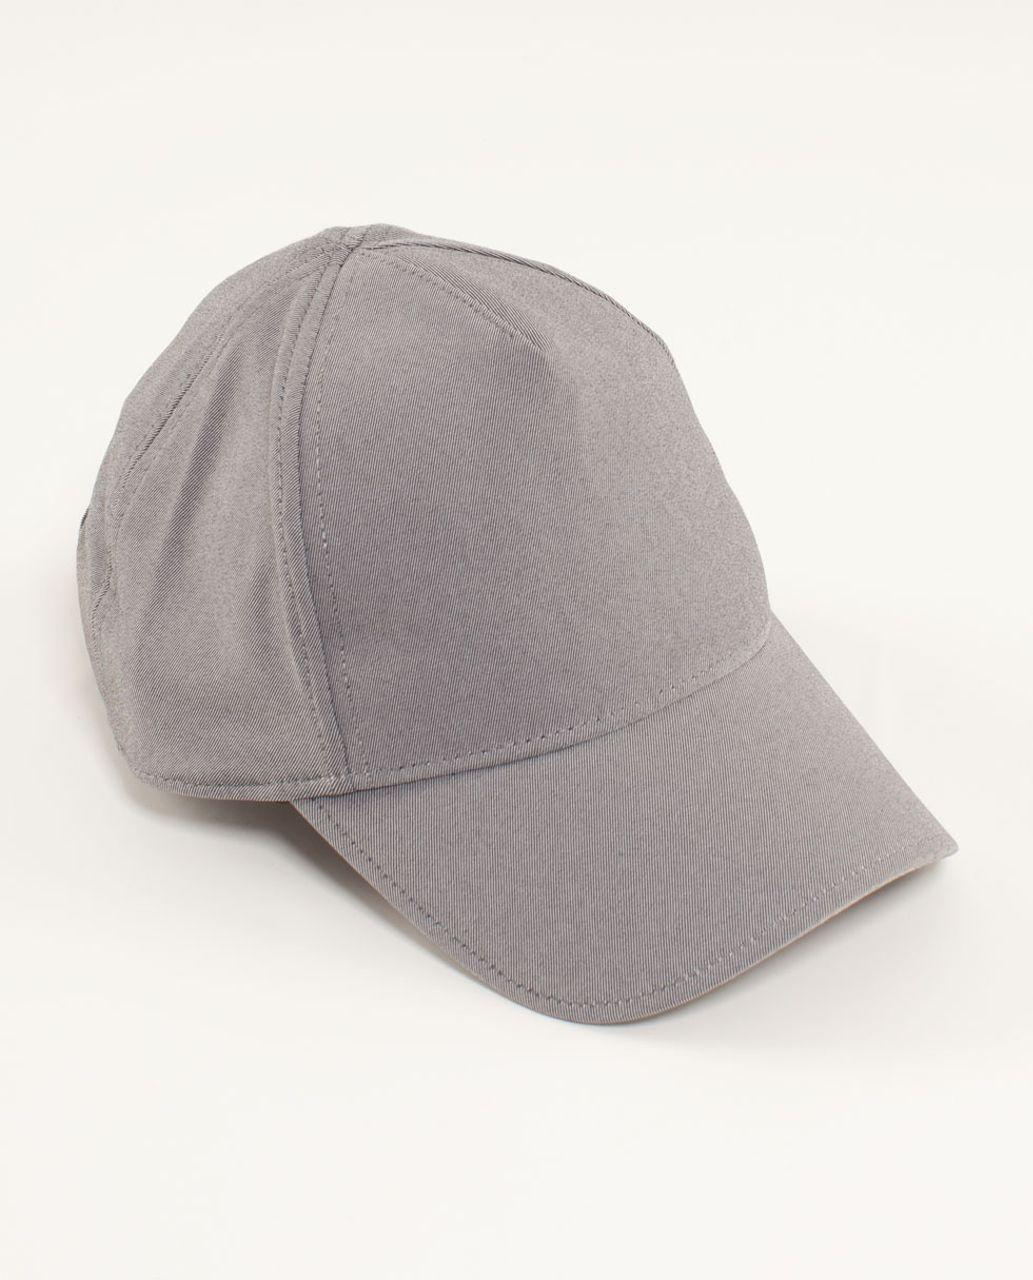 Lululemon Classy Cap - Soot